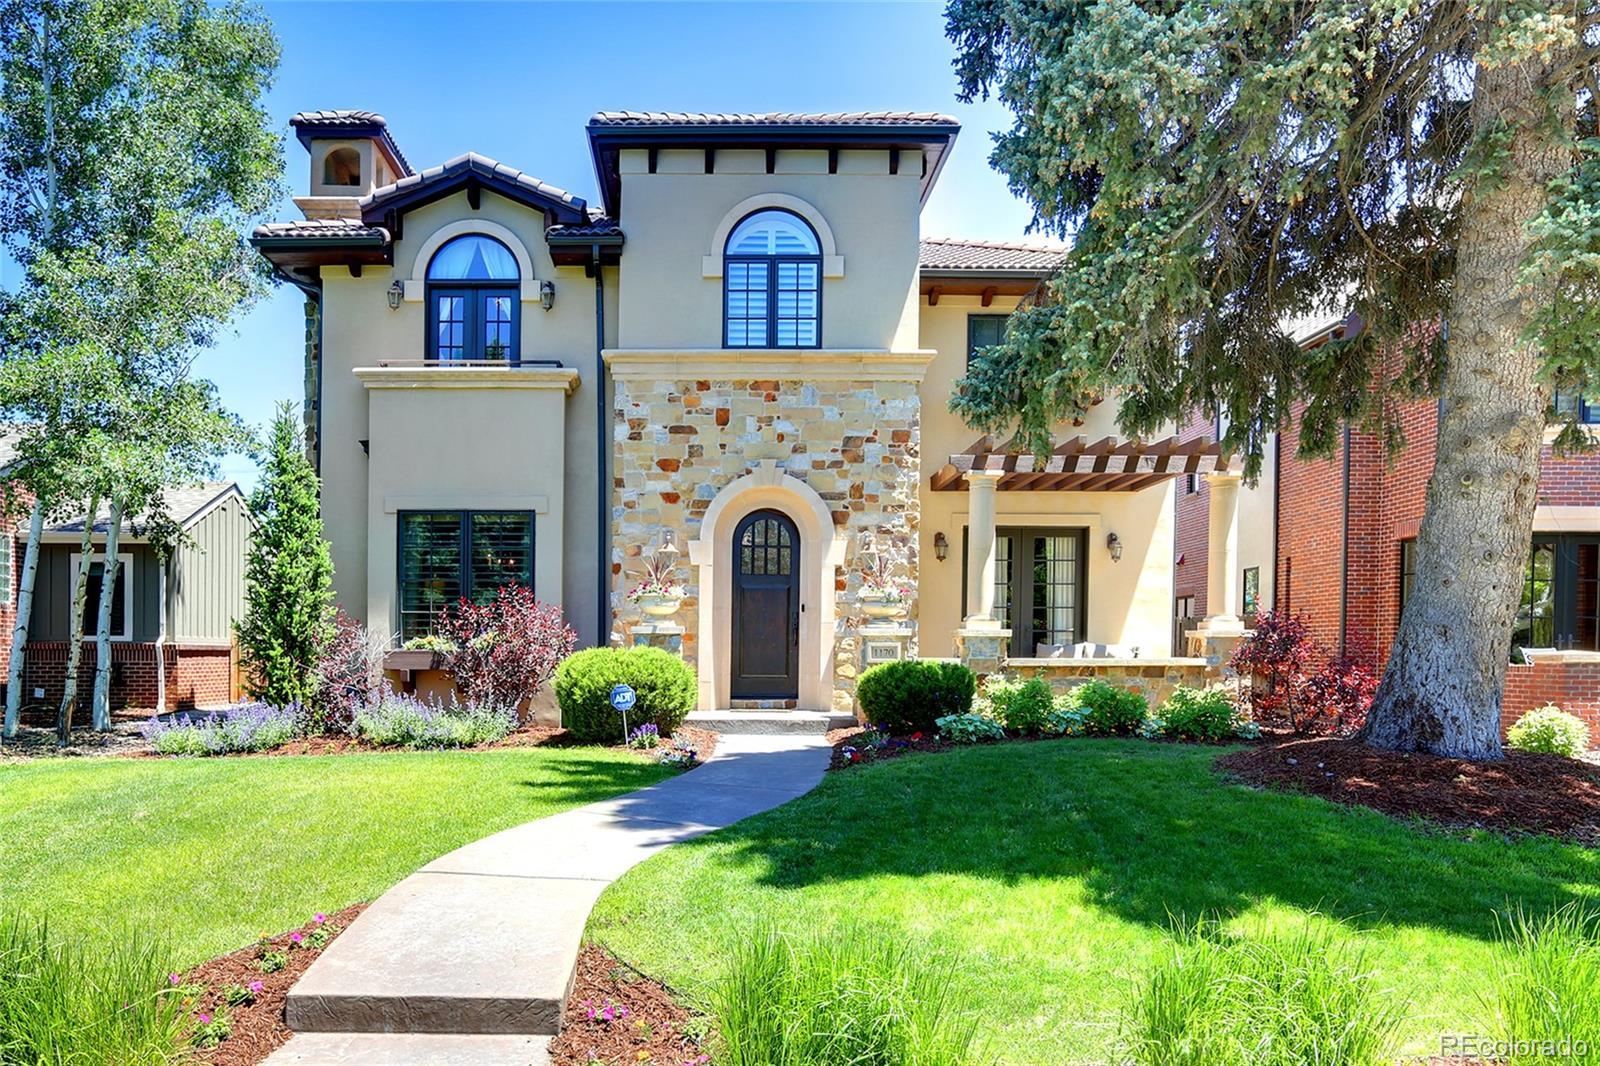 1170 S Saint Paul Street Property Photo - Denver, CO real estate listing